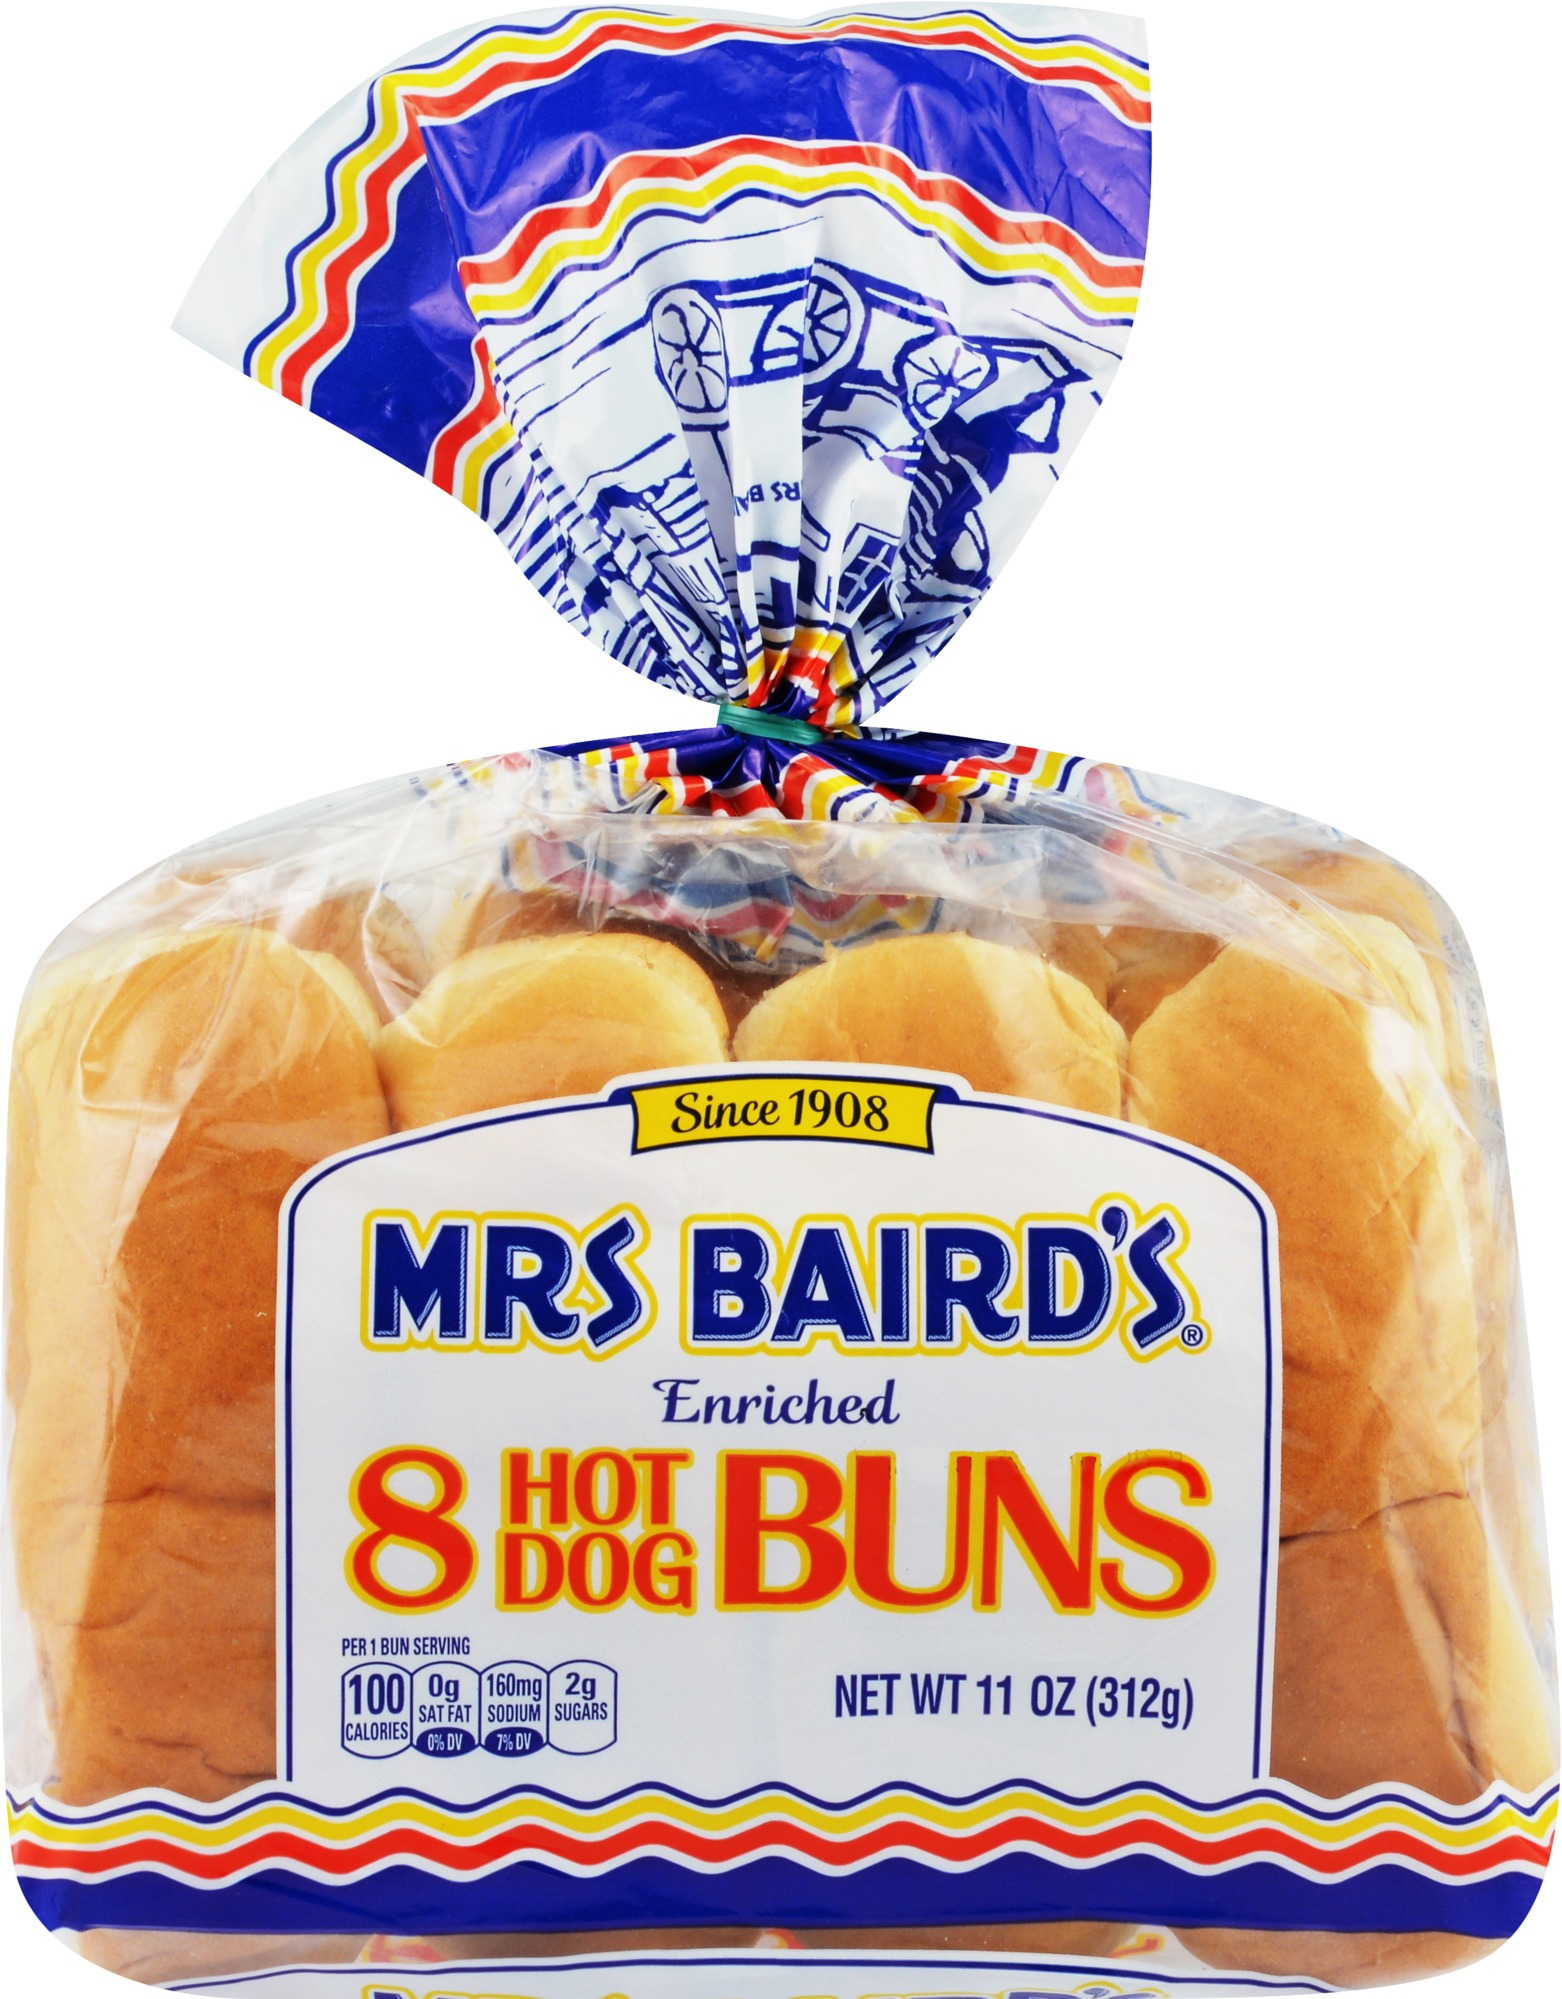 Image Result For Mrs Baird S Dog Buns